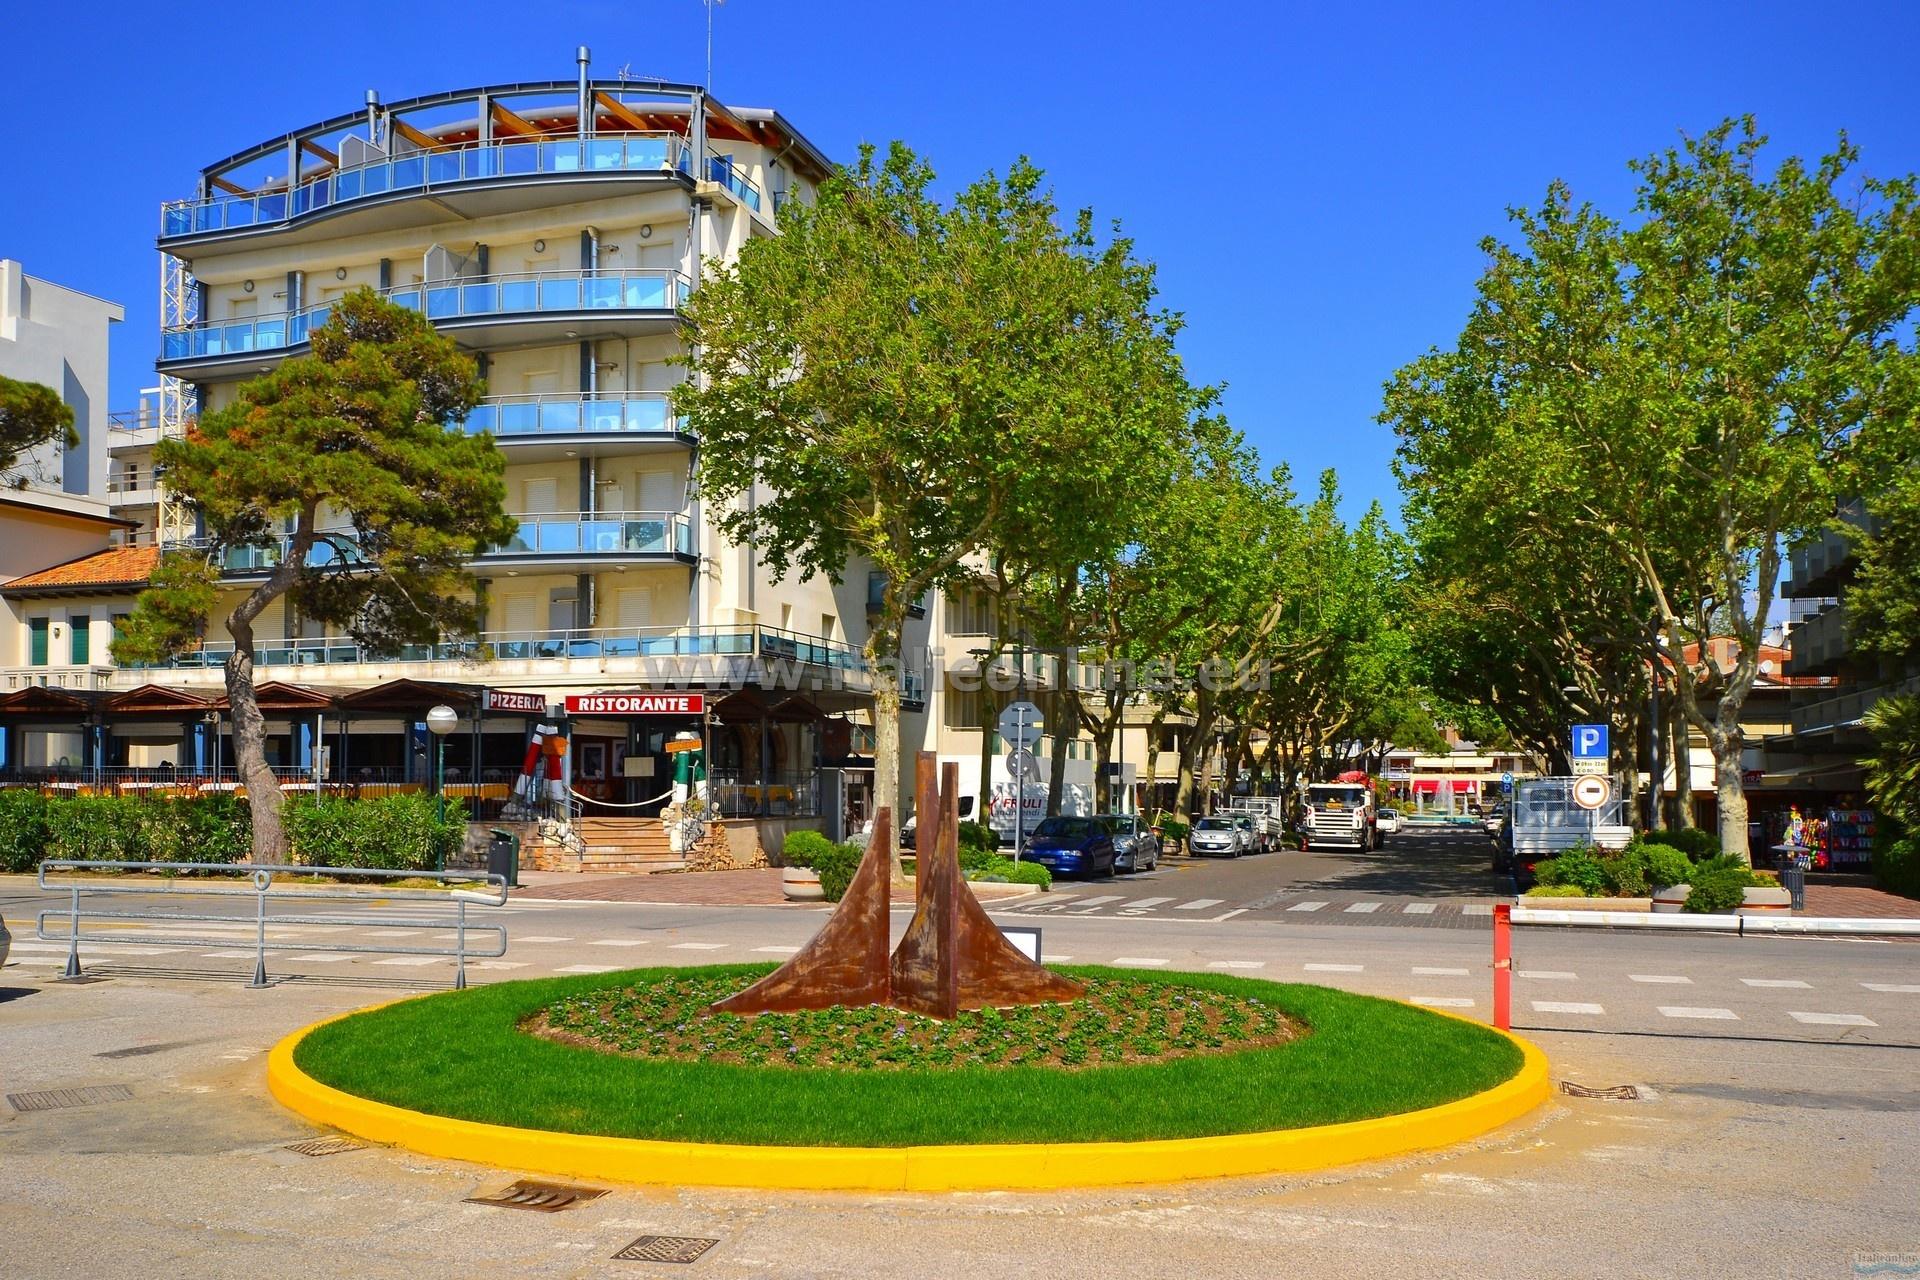 Appartamenti sunbeach lignano sabbiadoro italien italieonline for Appartamenti lignano